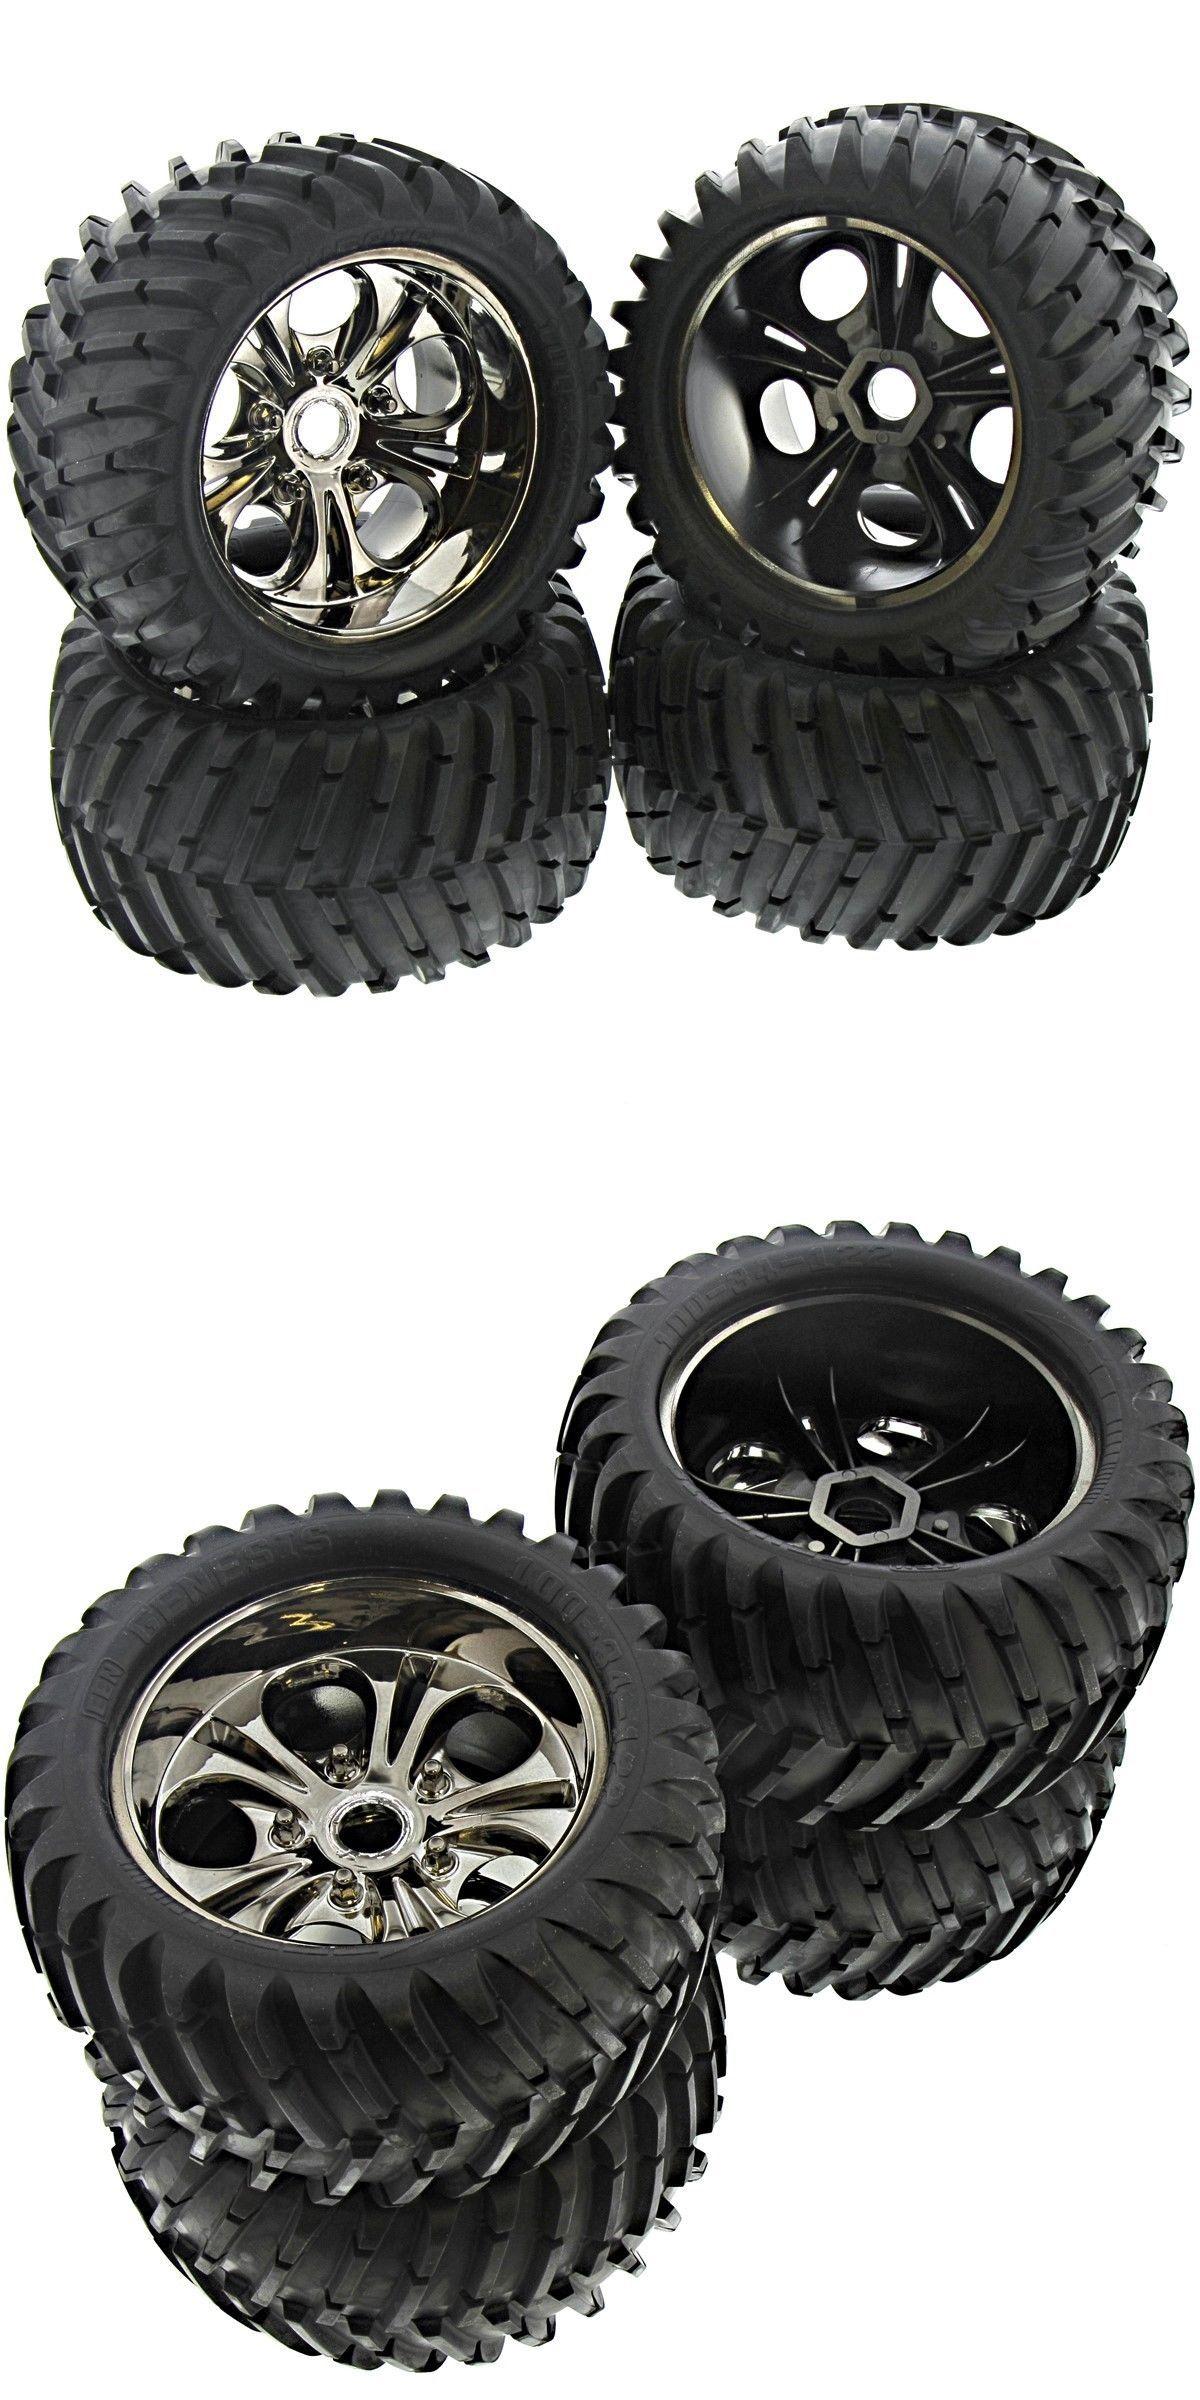 Wheels Tires Rims And Hubs 182201 Cen Racing Colossus Xt Reeper